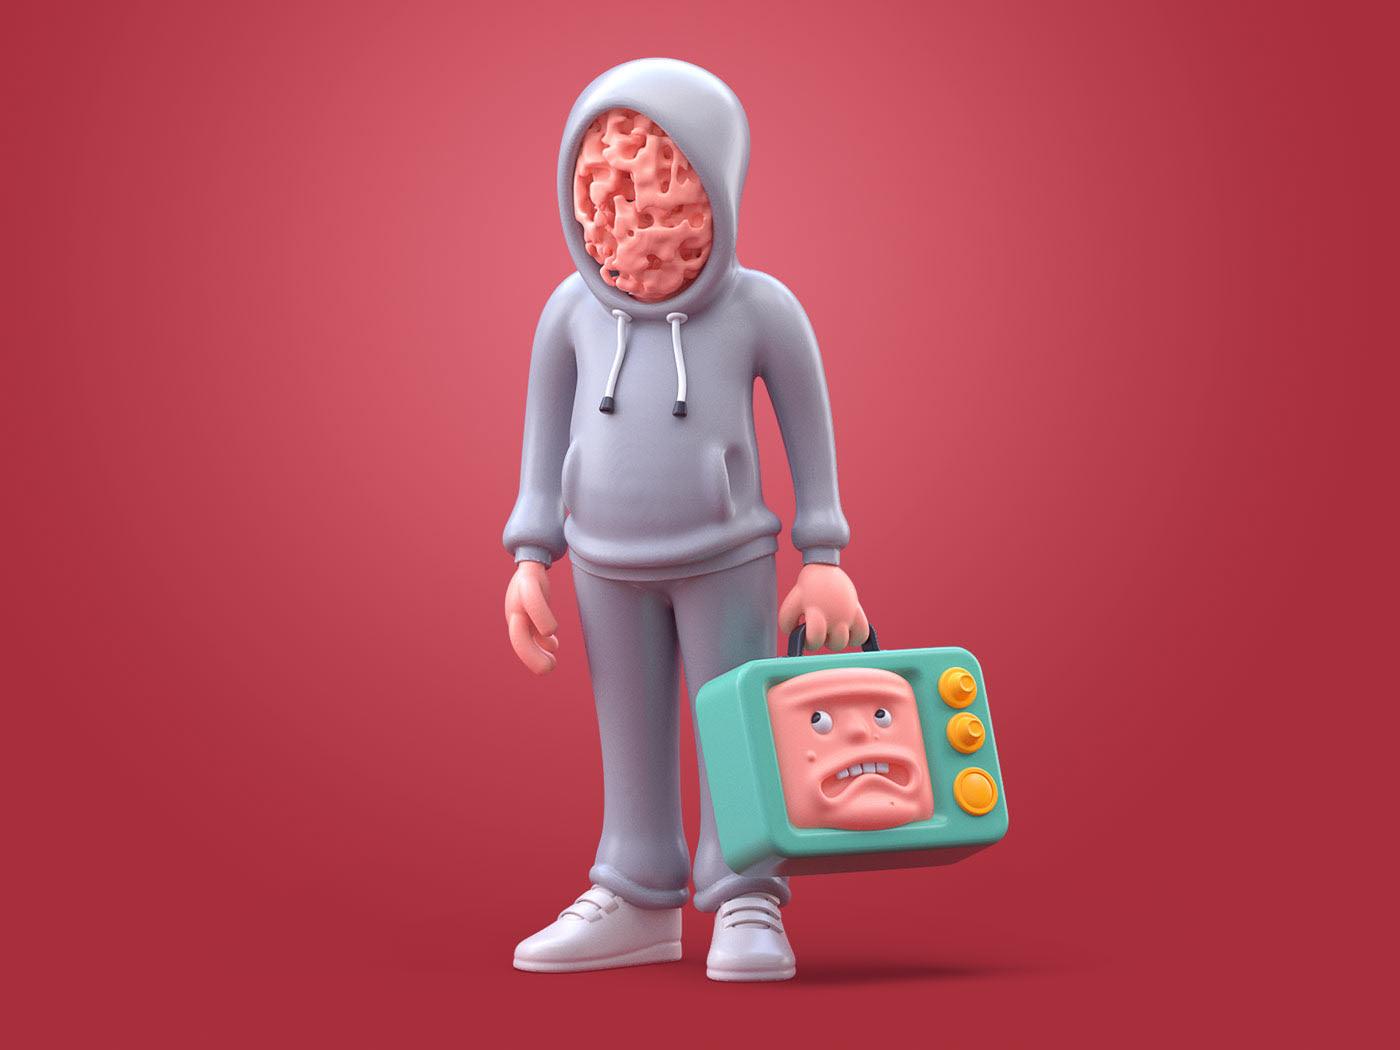 3d model bake face by zhivko terziivanov